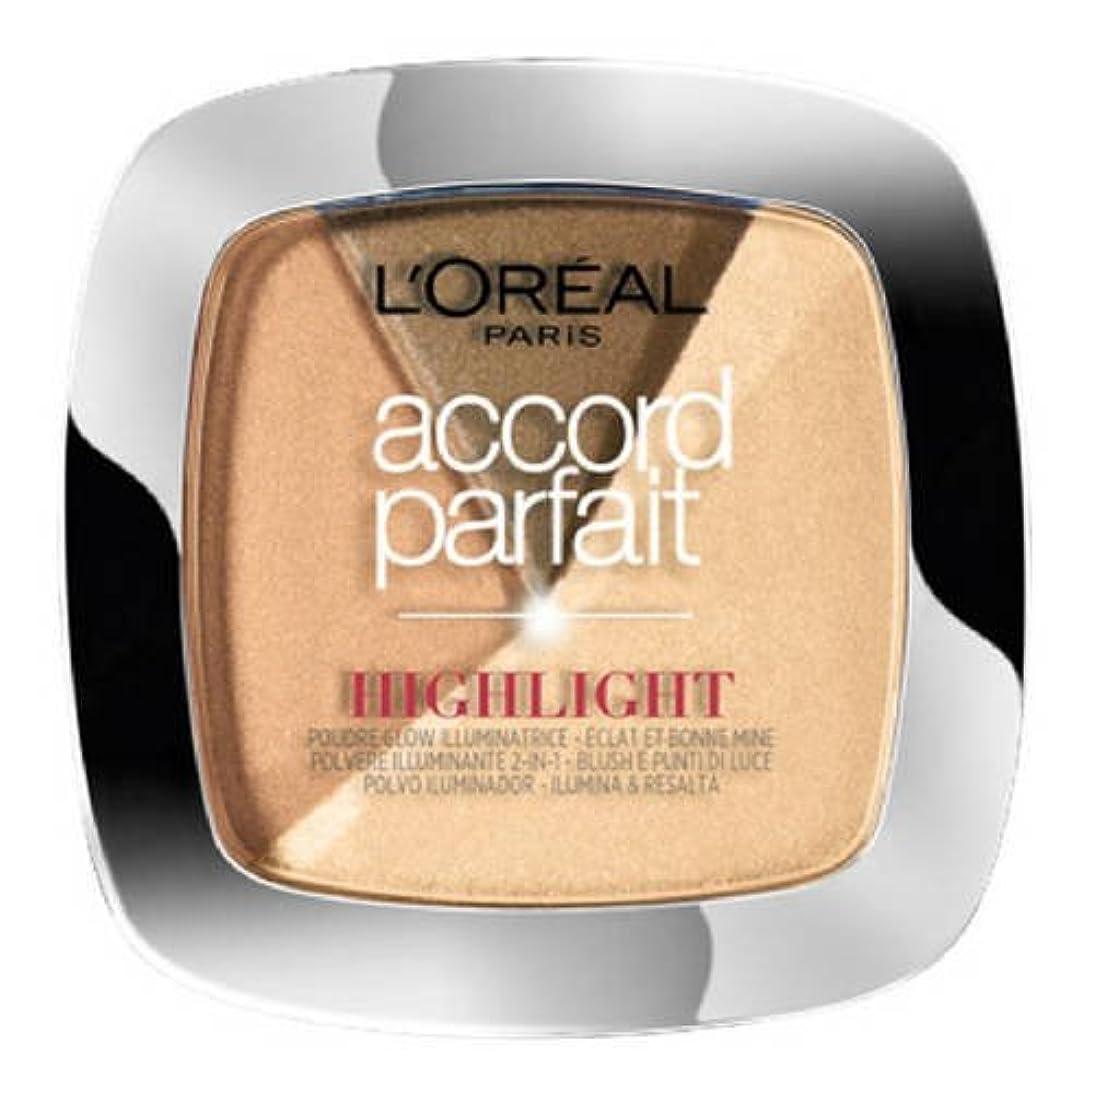 溶接畝間名詞L 'Oréal Paris - ACCORD PARFAIT Highlight Enlumineur Poudre - 102 Dore